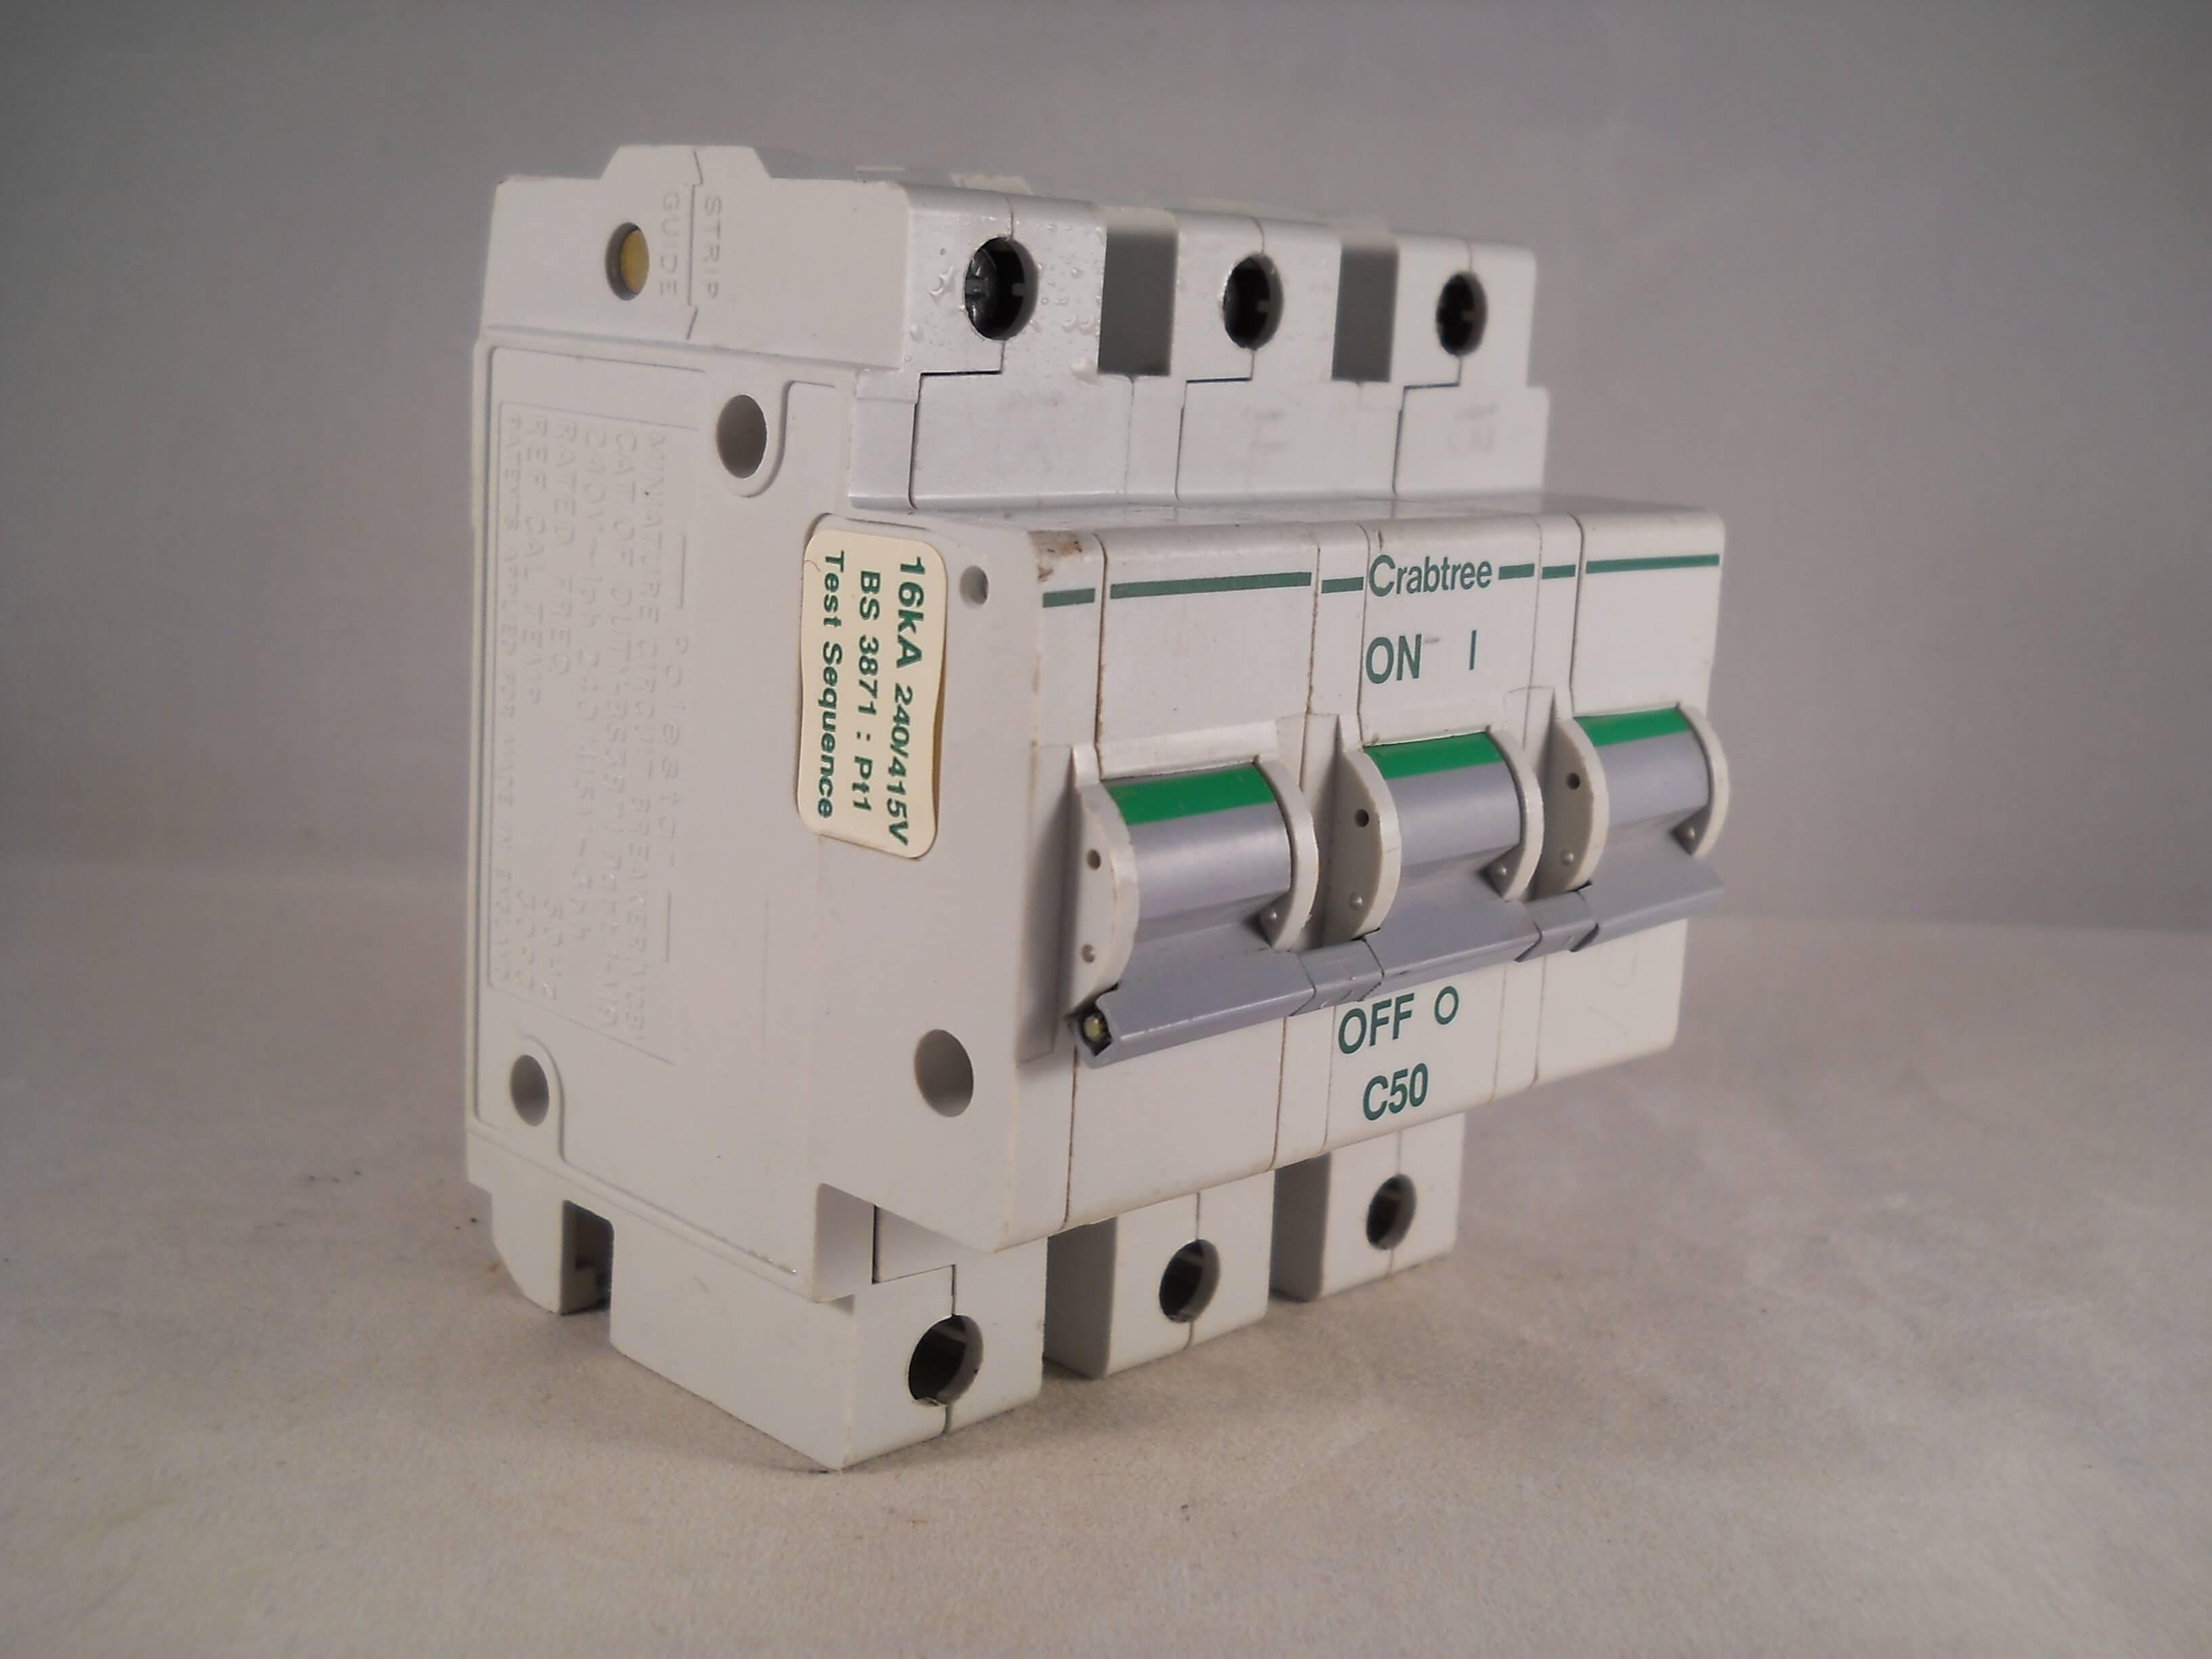 60C//50 CRABTREE POLESTAR 50 AMP TYPE C SINGLE POLE CIRCUIT BREAKER